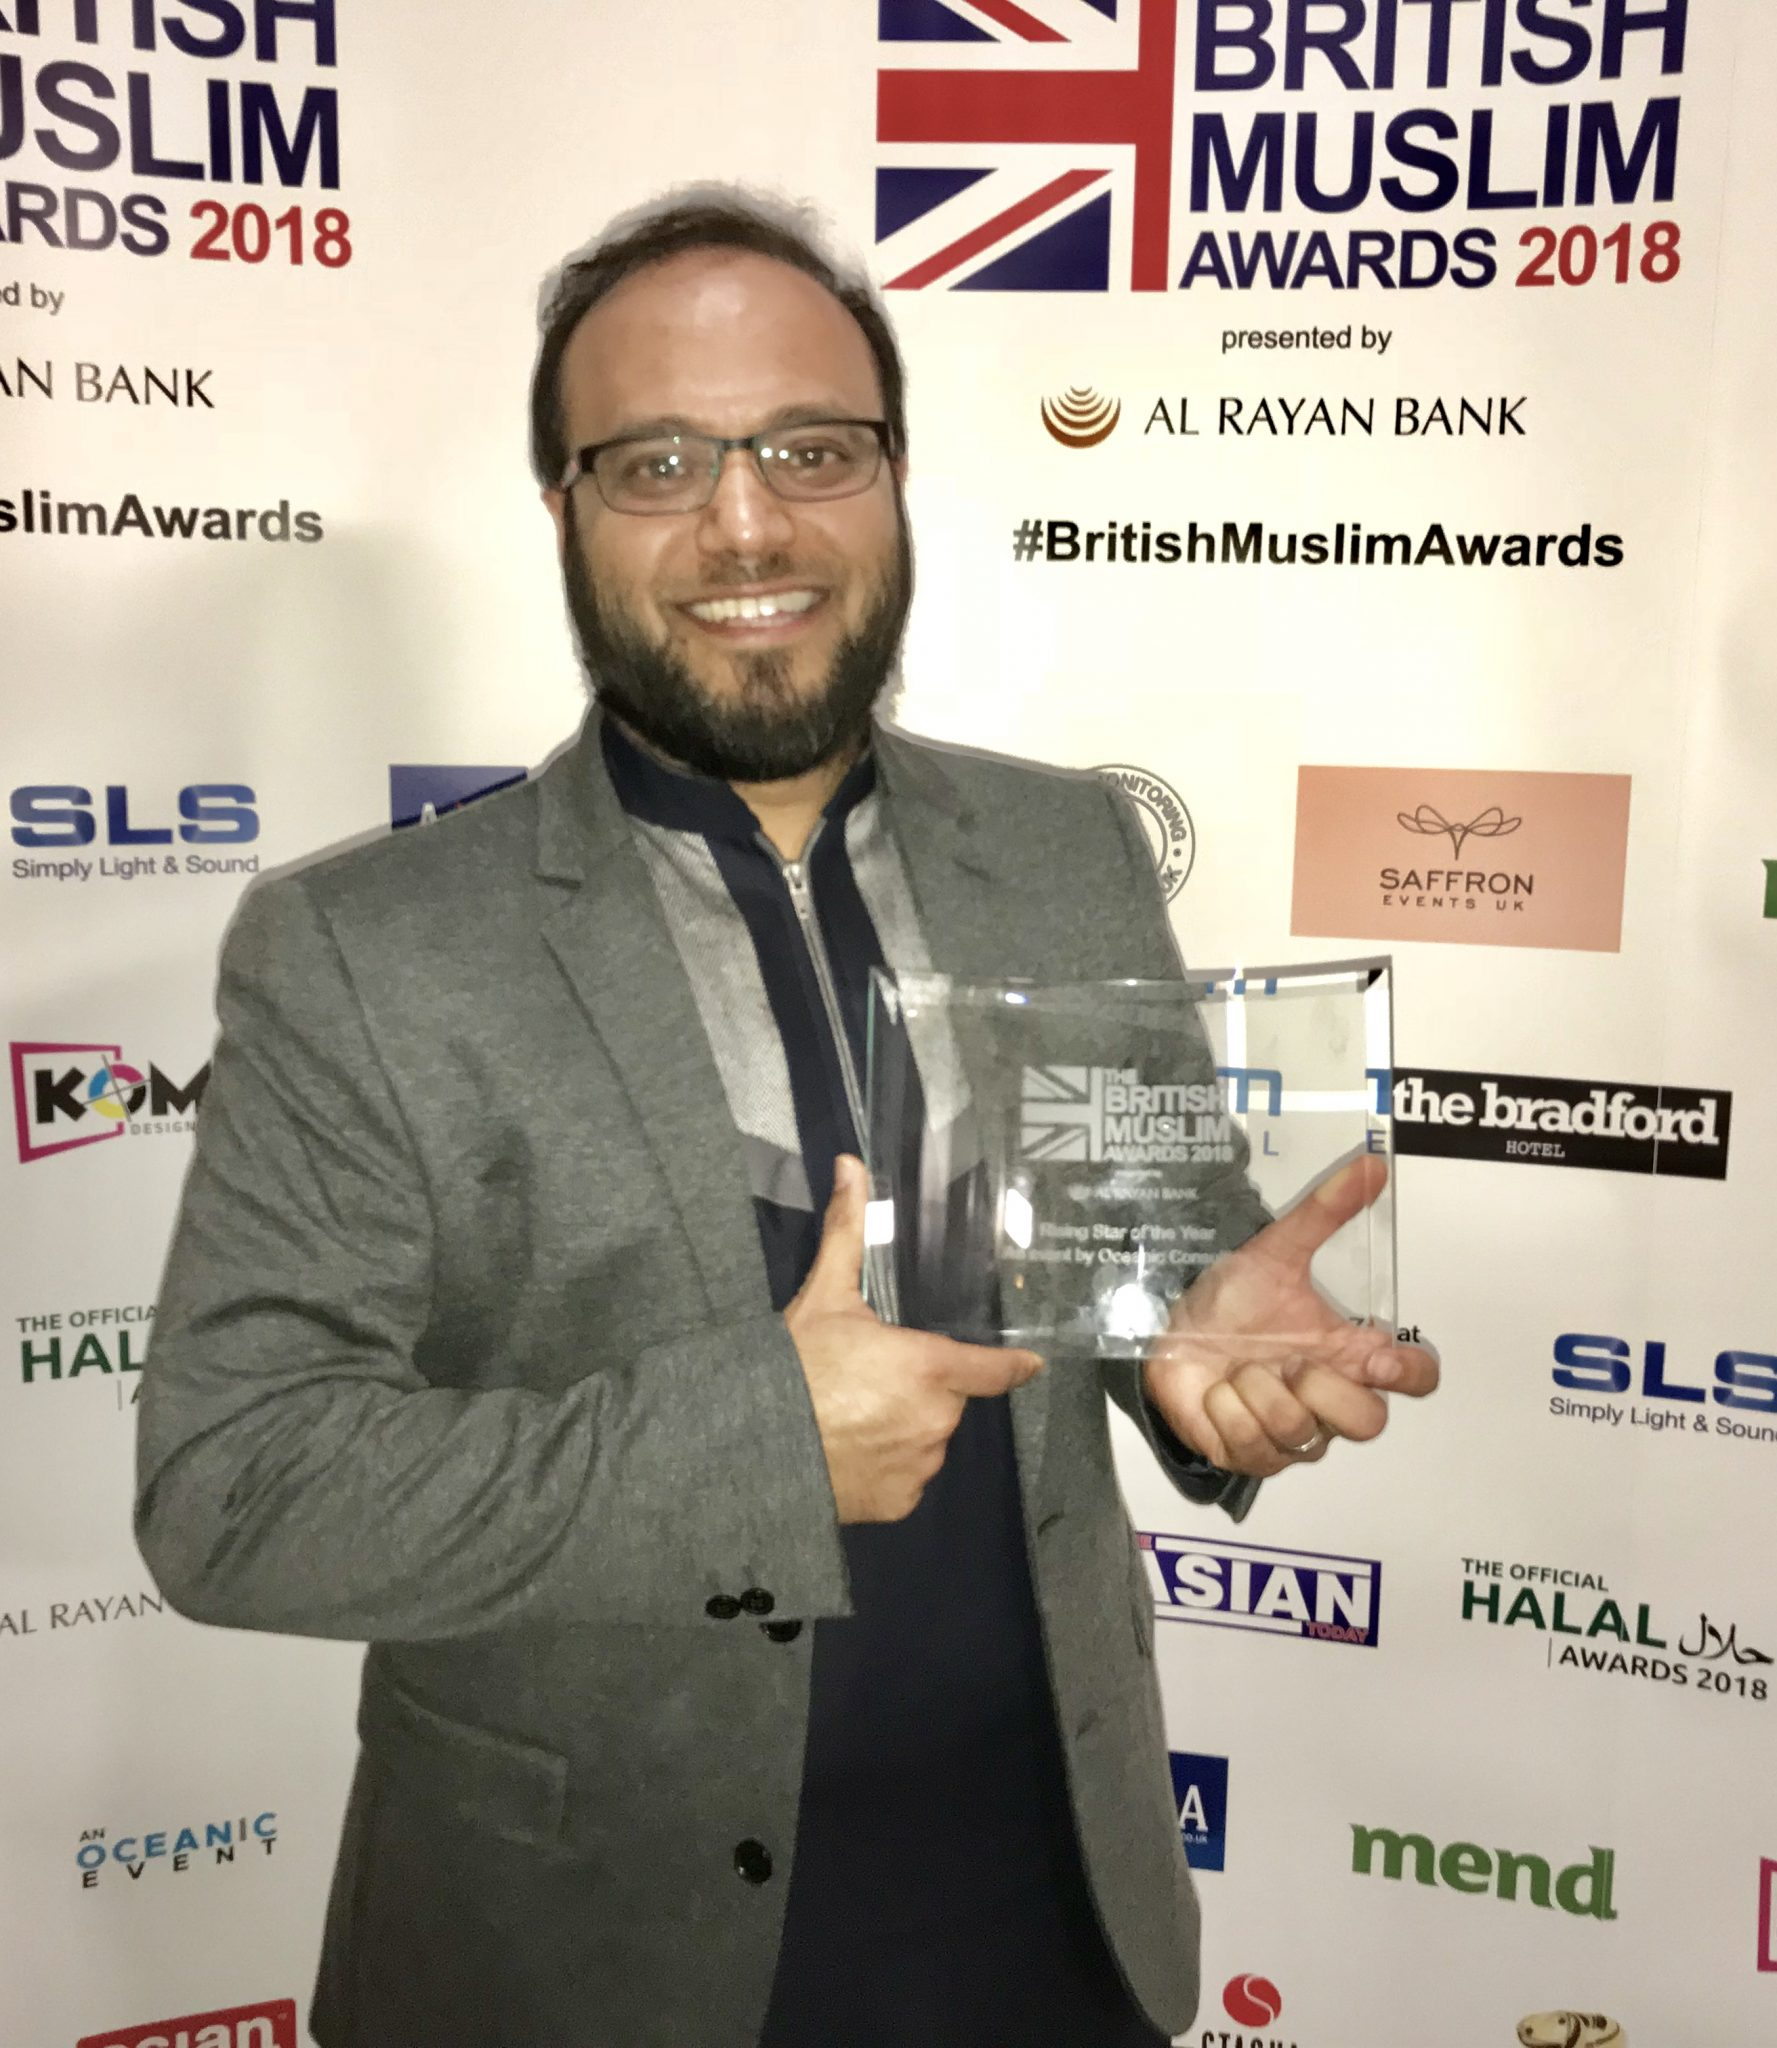 Winner of the highest British award, who shot their